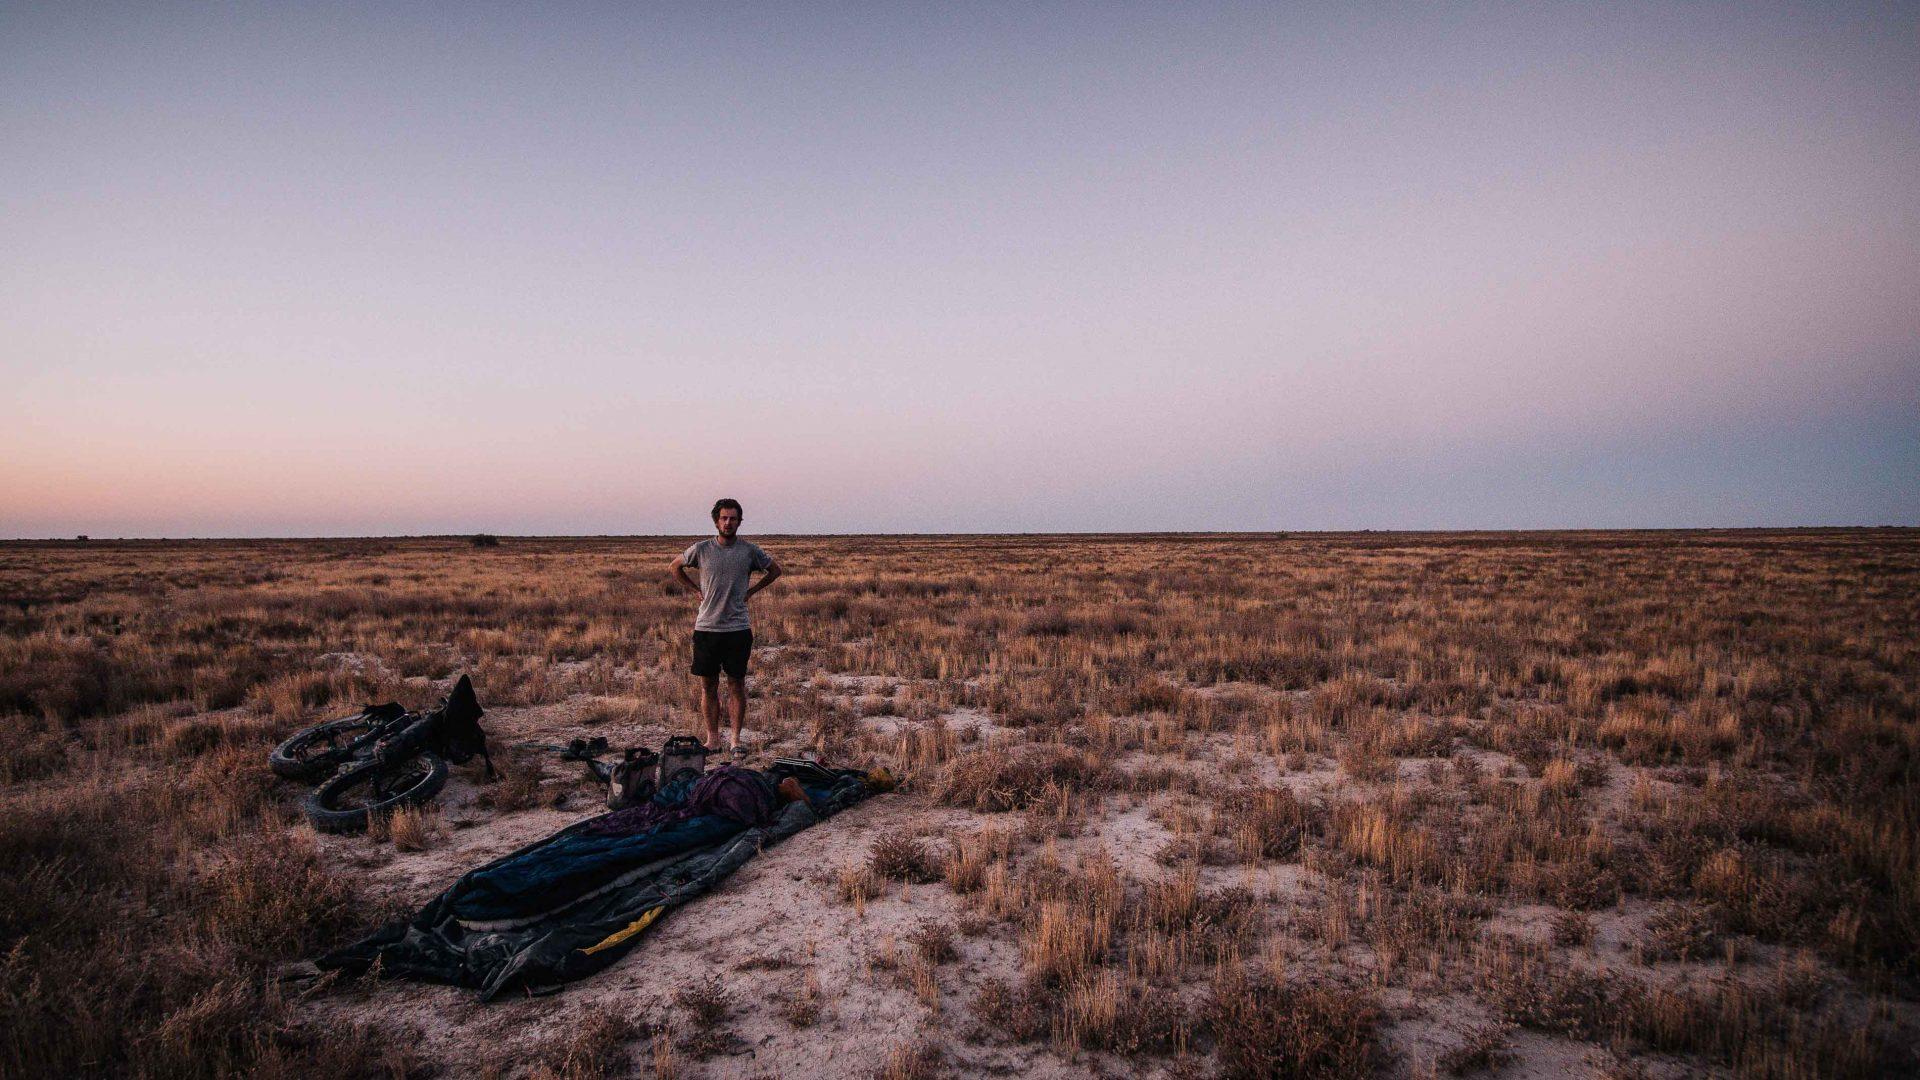 Setting up camp in Uzbekistan's Karakalpakstan Desert.